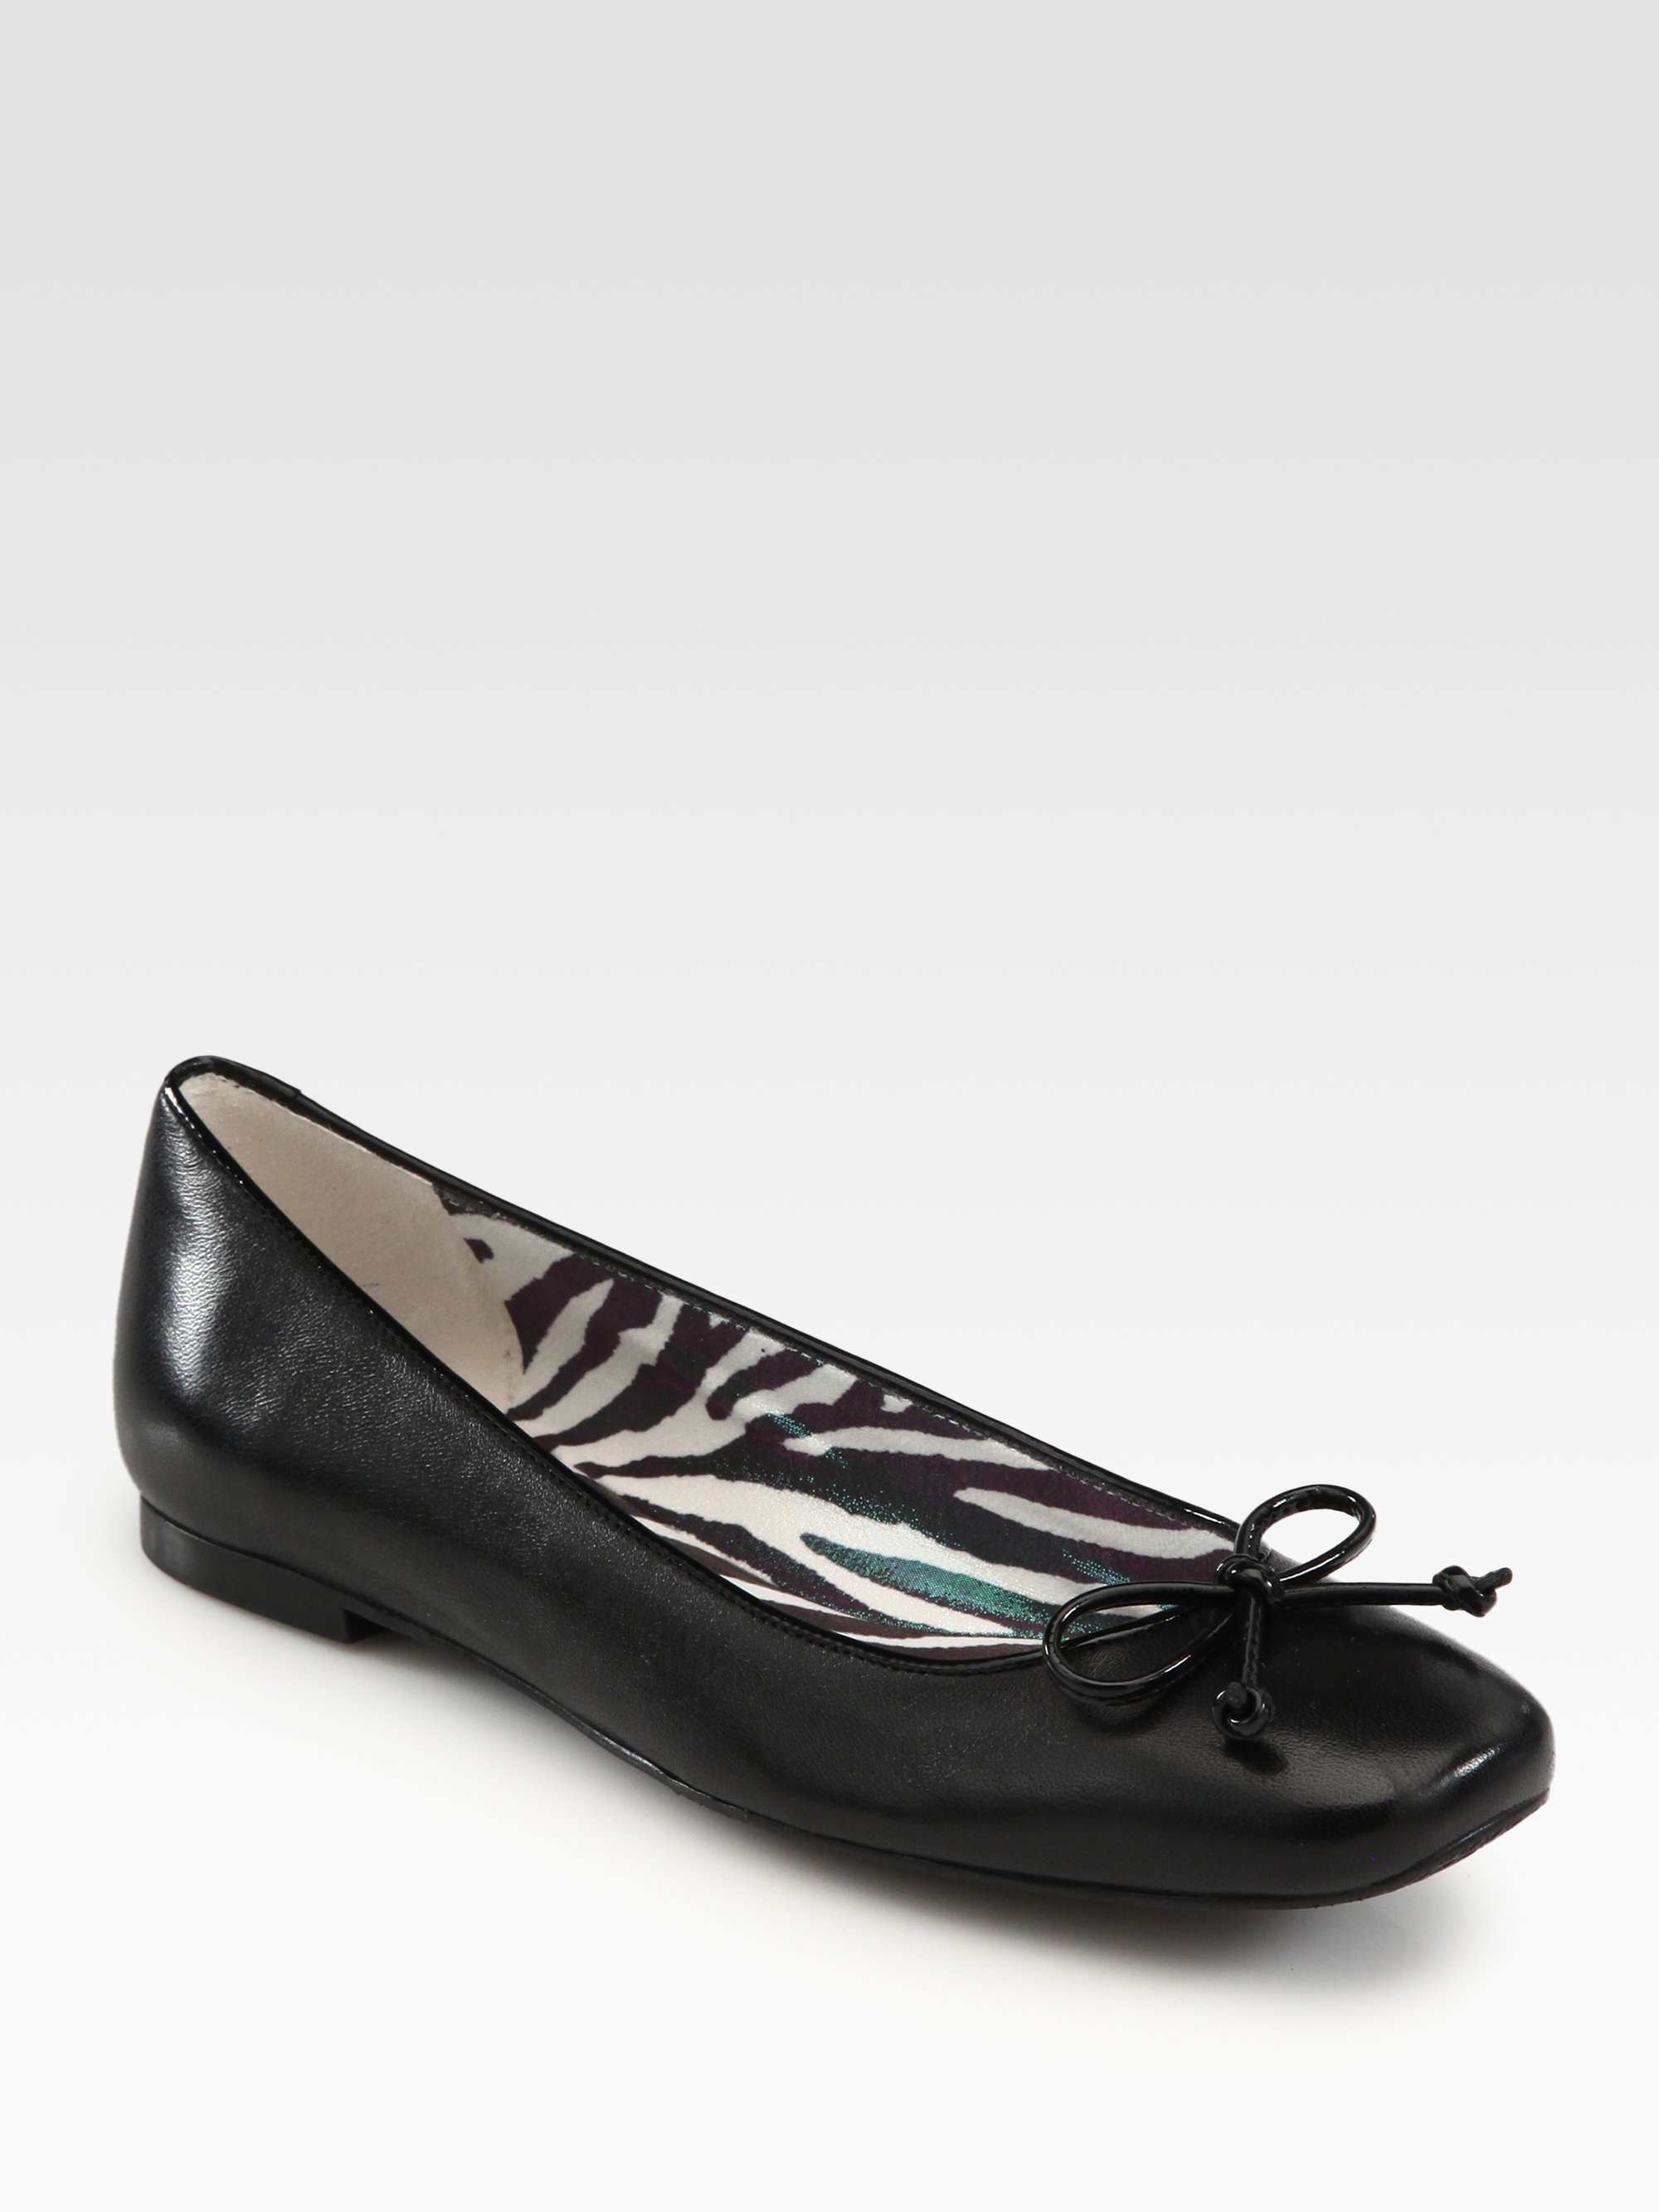 Stuart Weitzman Stringon Leather Ballet Flats In Black Lyst